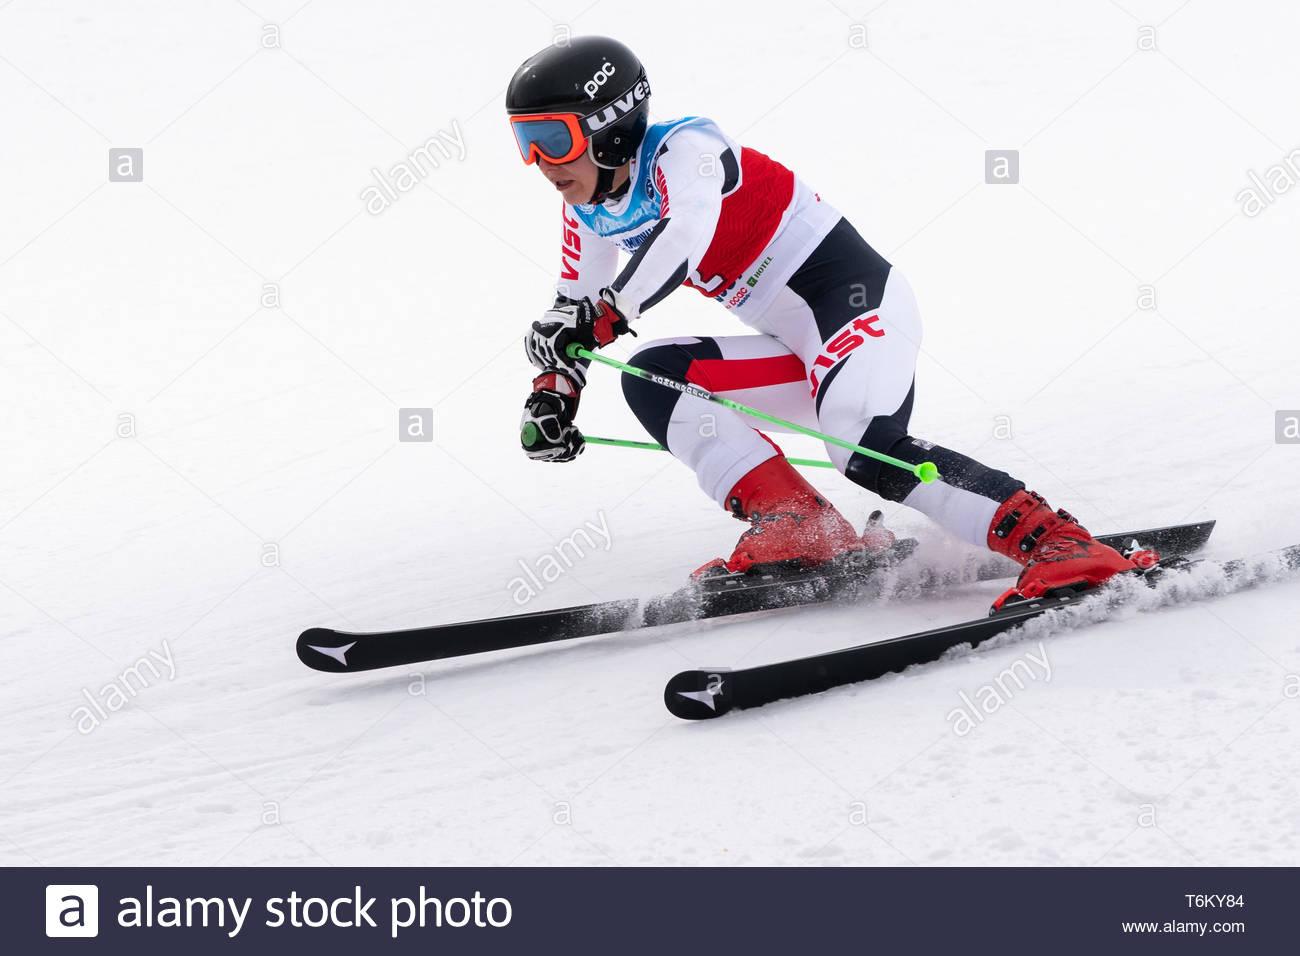 KAMCHATKA, RUSSIA - APR 2, 2019: Mountain skier Timchenko Elizaveta (Kamchatka Peninsula) skiing down mount. Russian Women's Alpine Skiing Cup, Intern - Stock Image